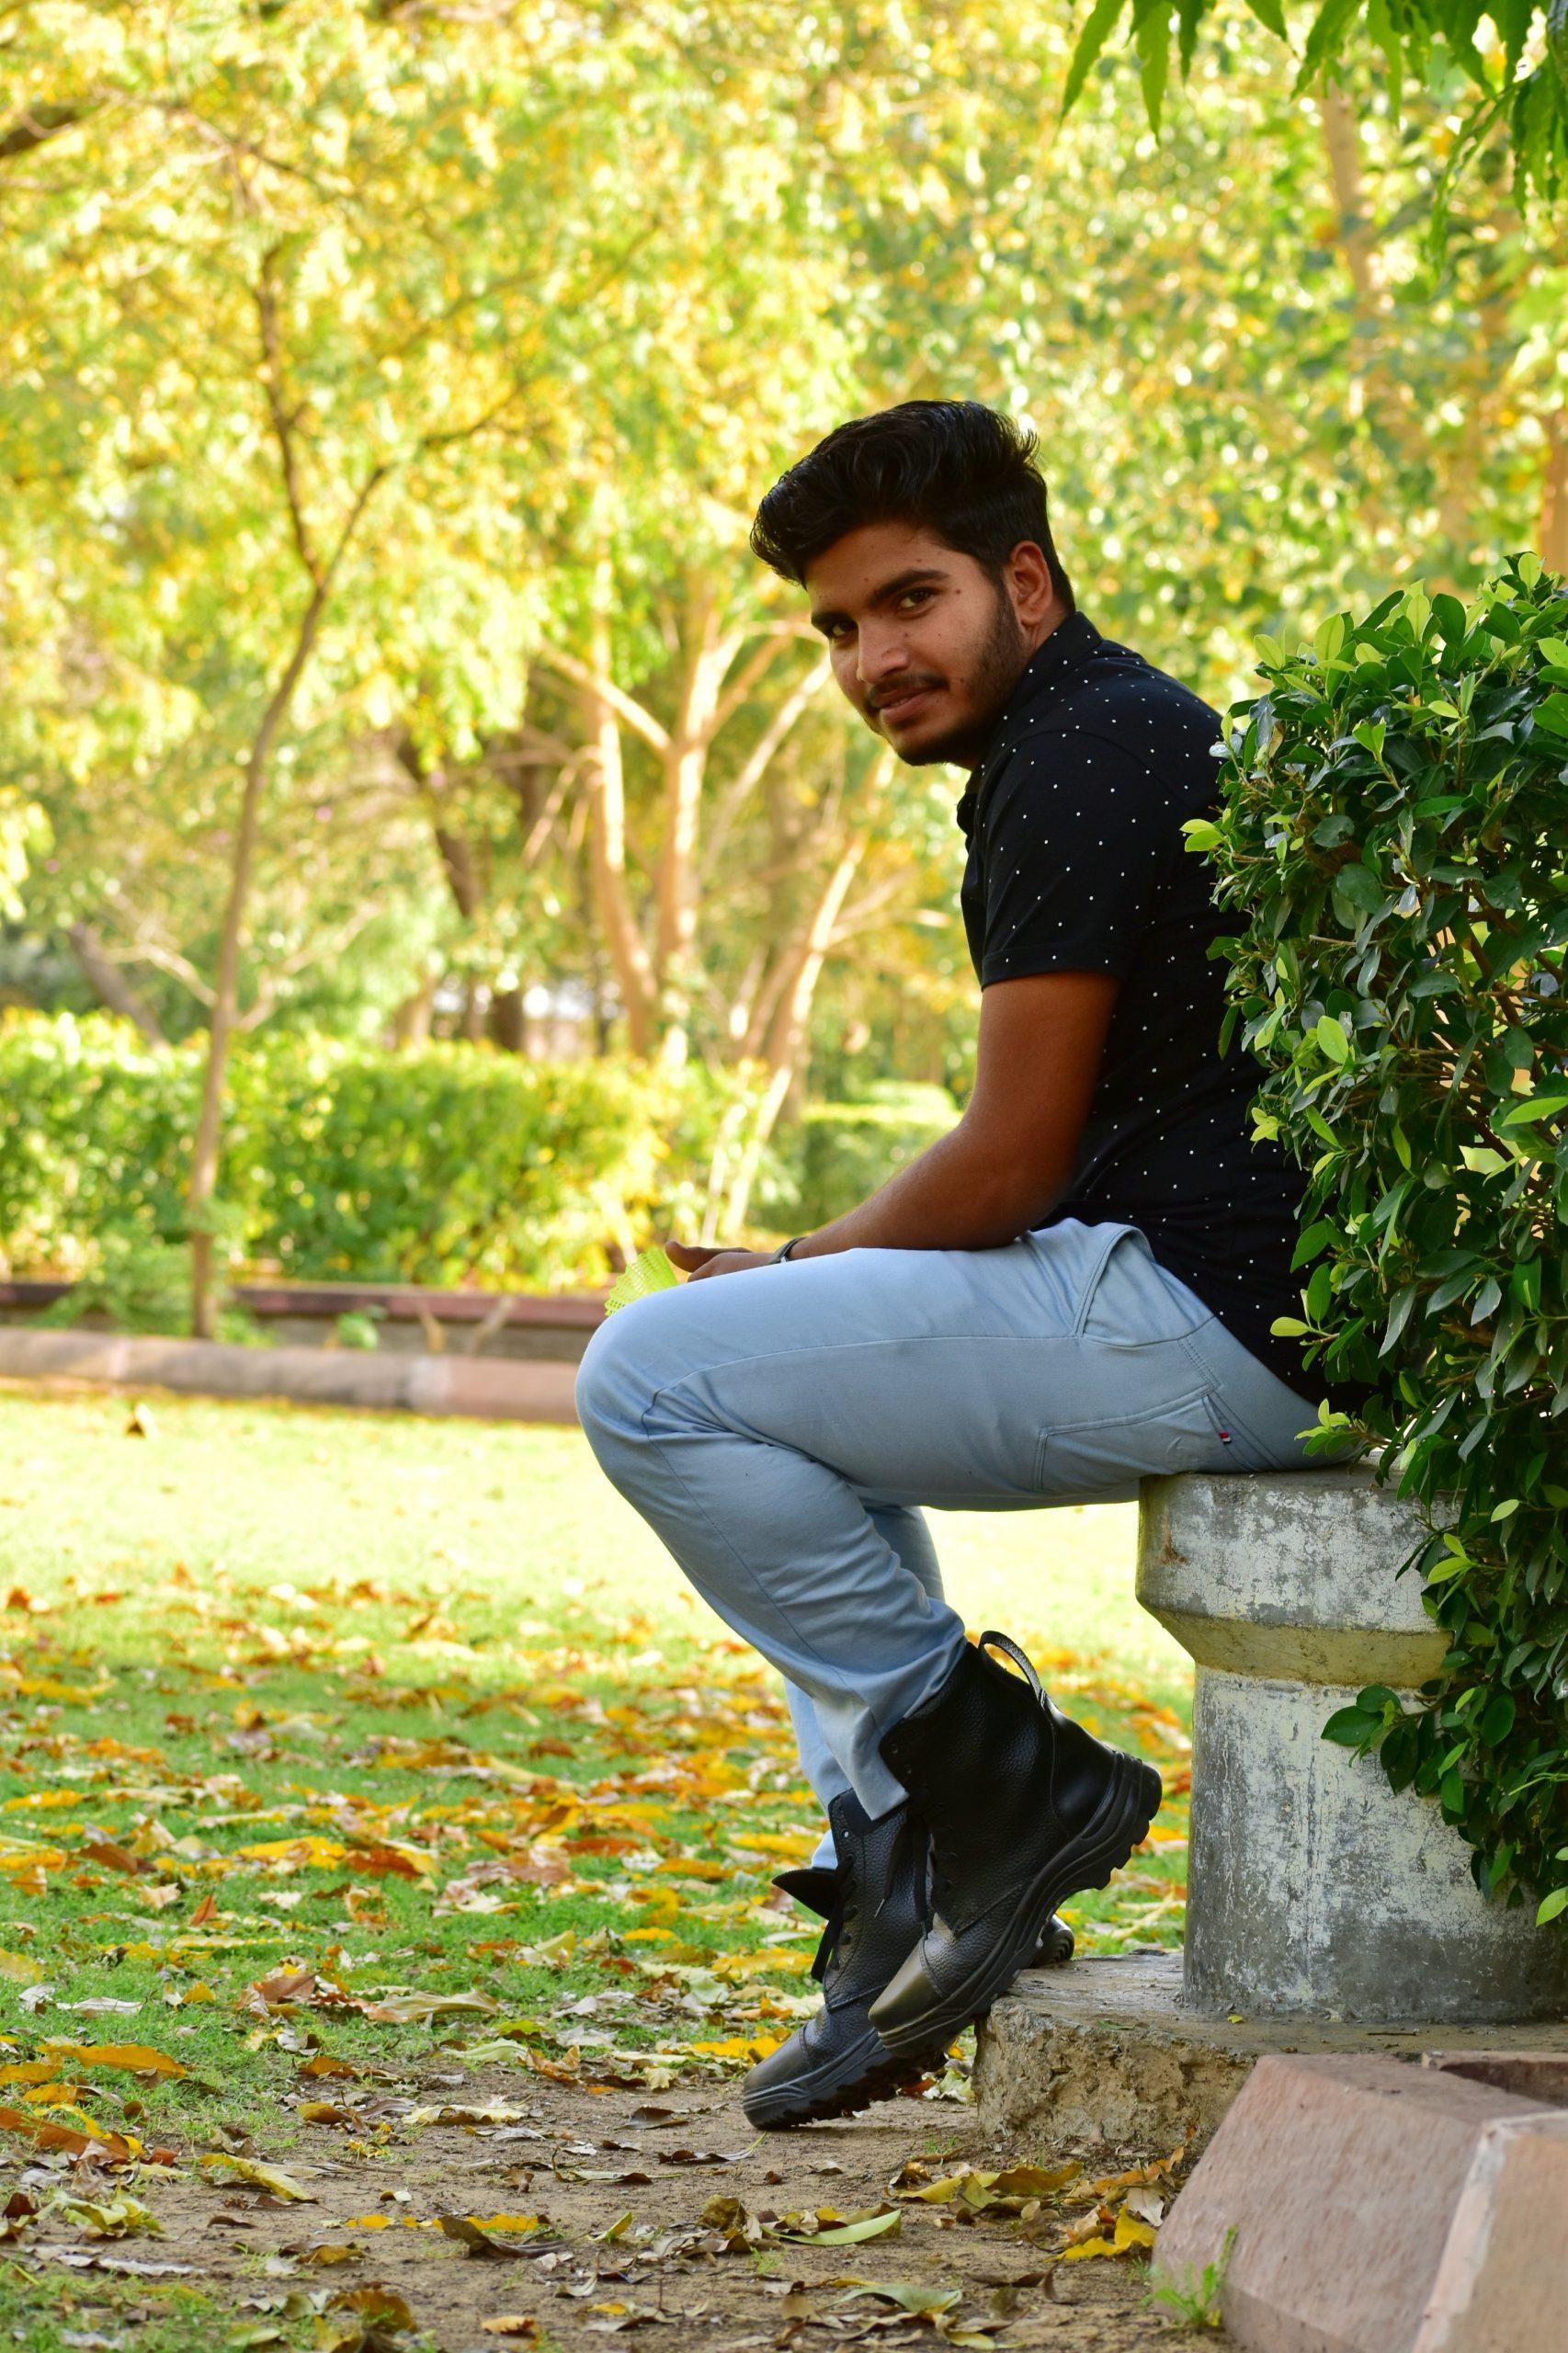 A boy in a park